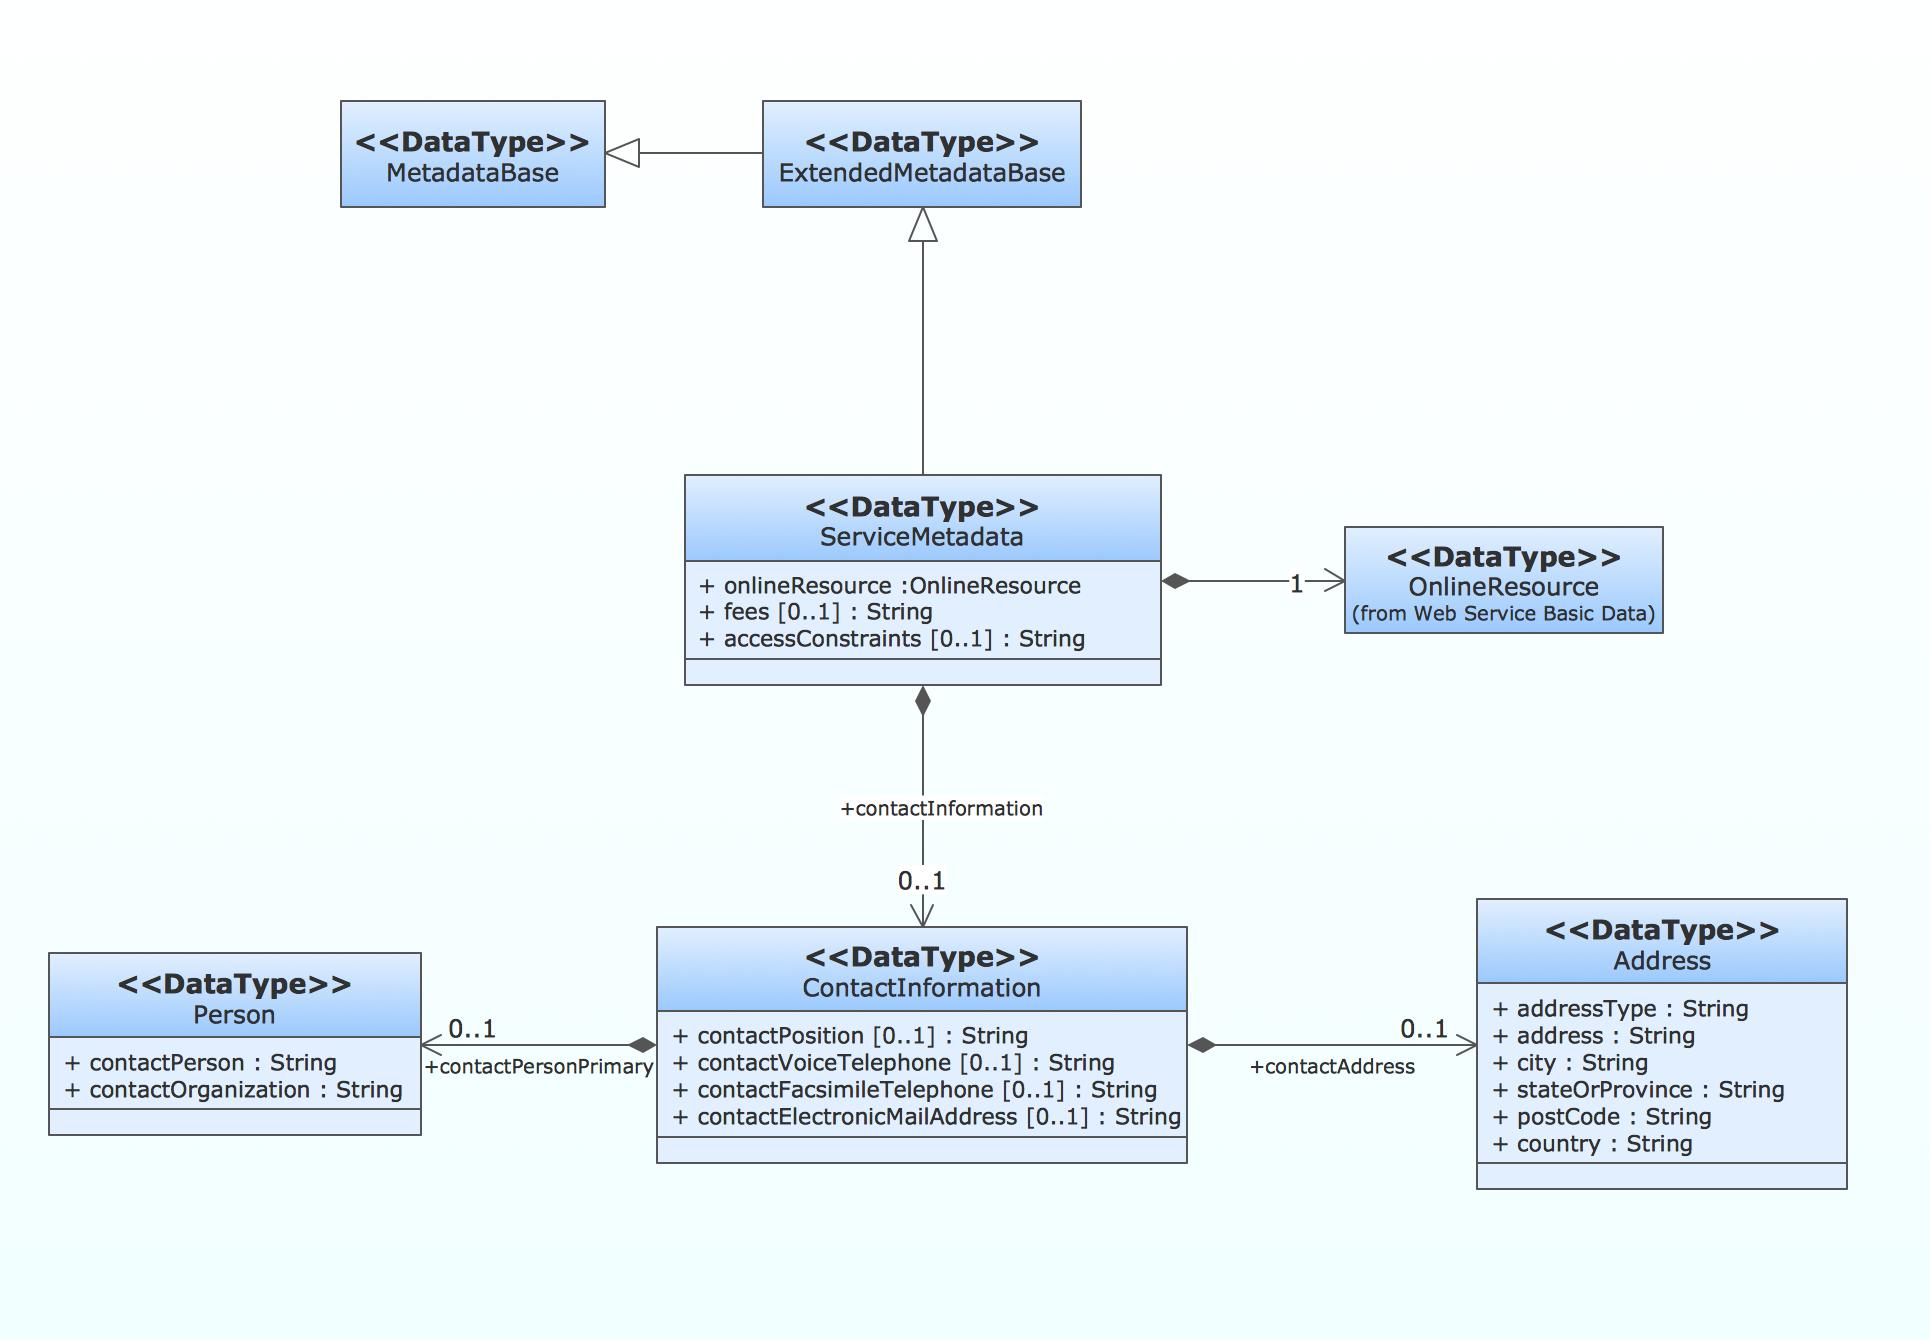 UML Class Diagram - Metadata Information Model